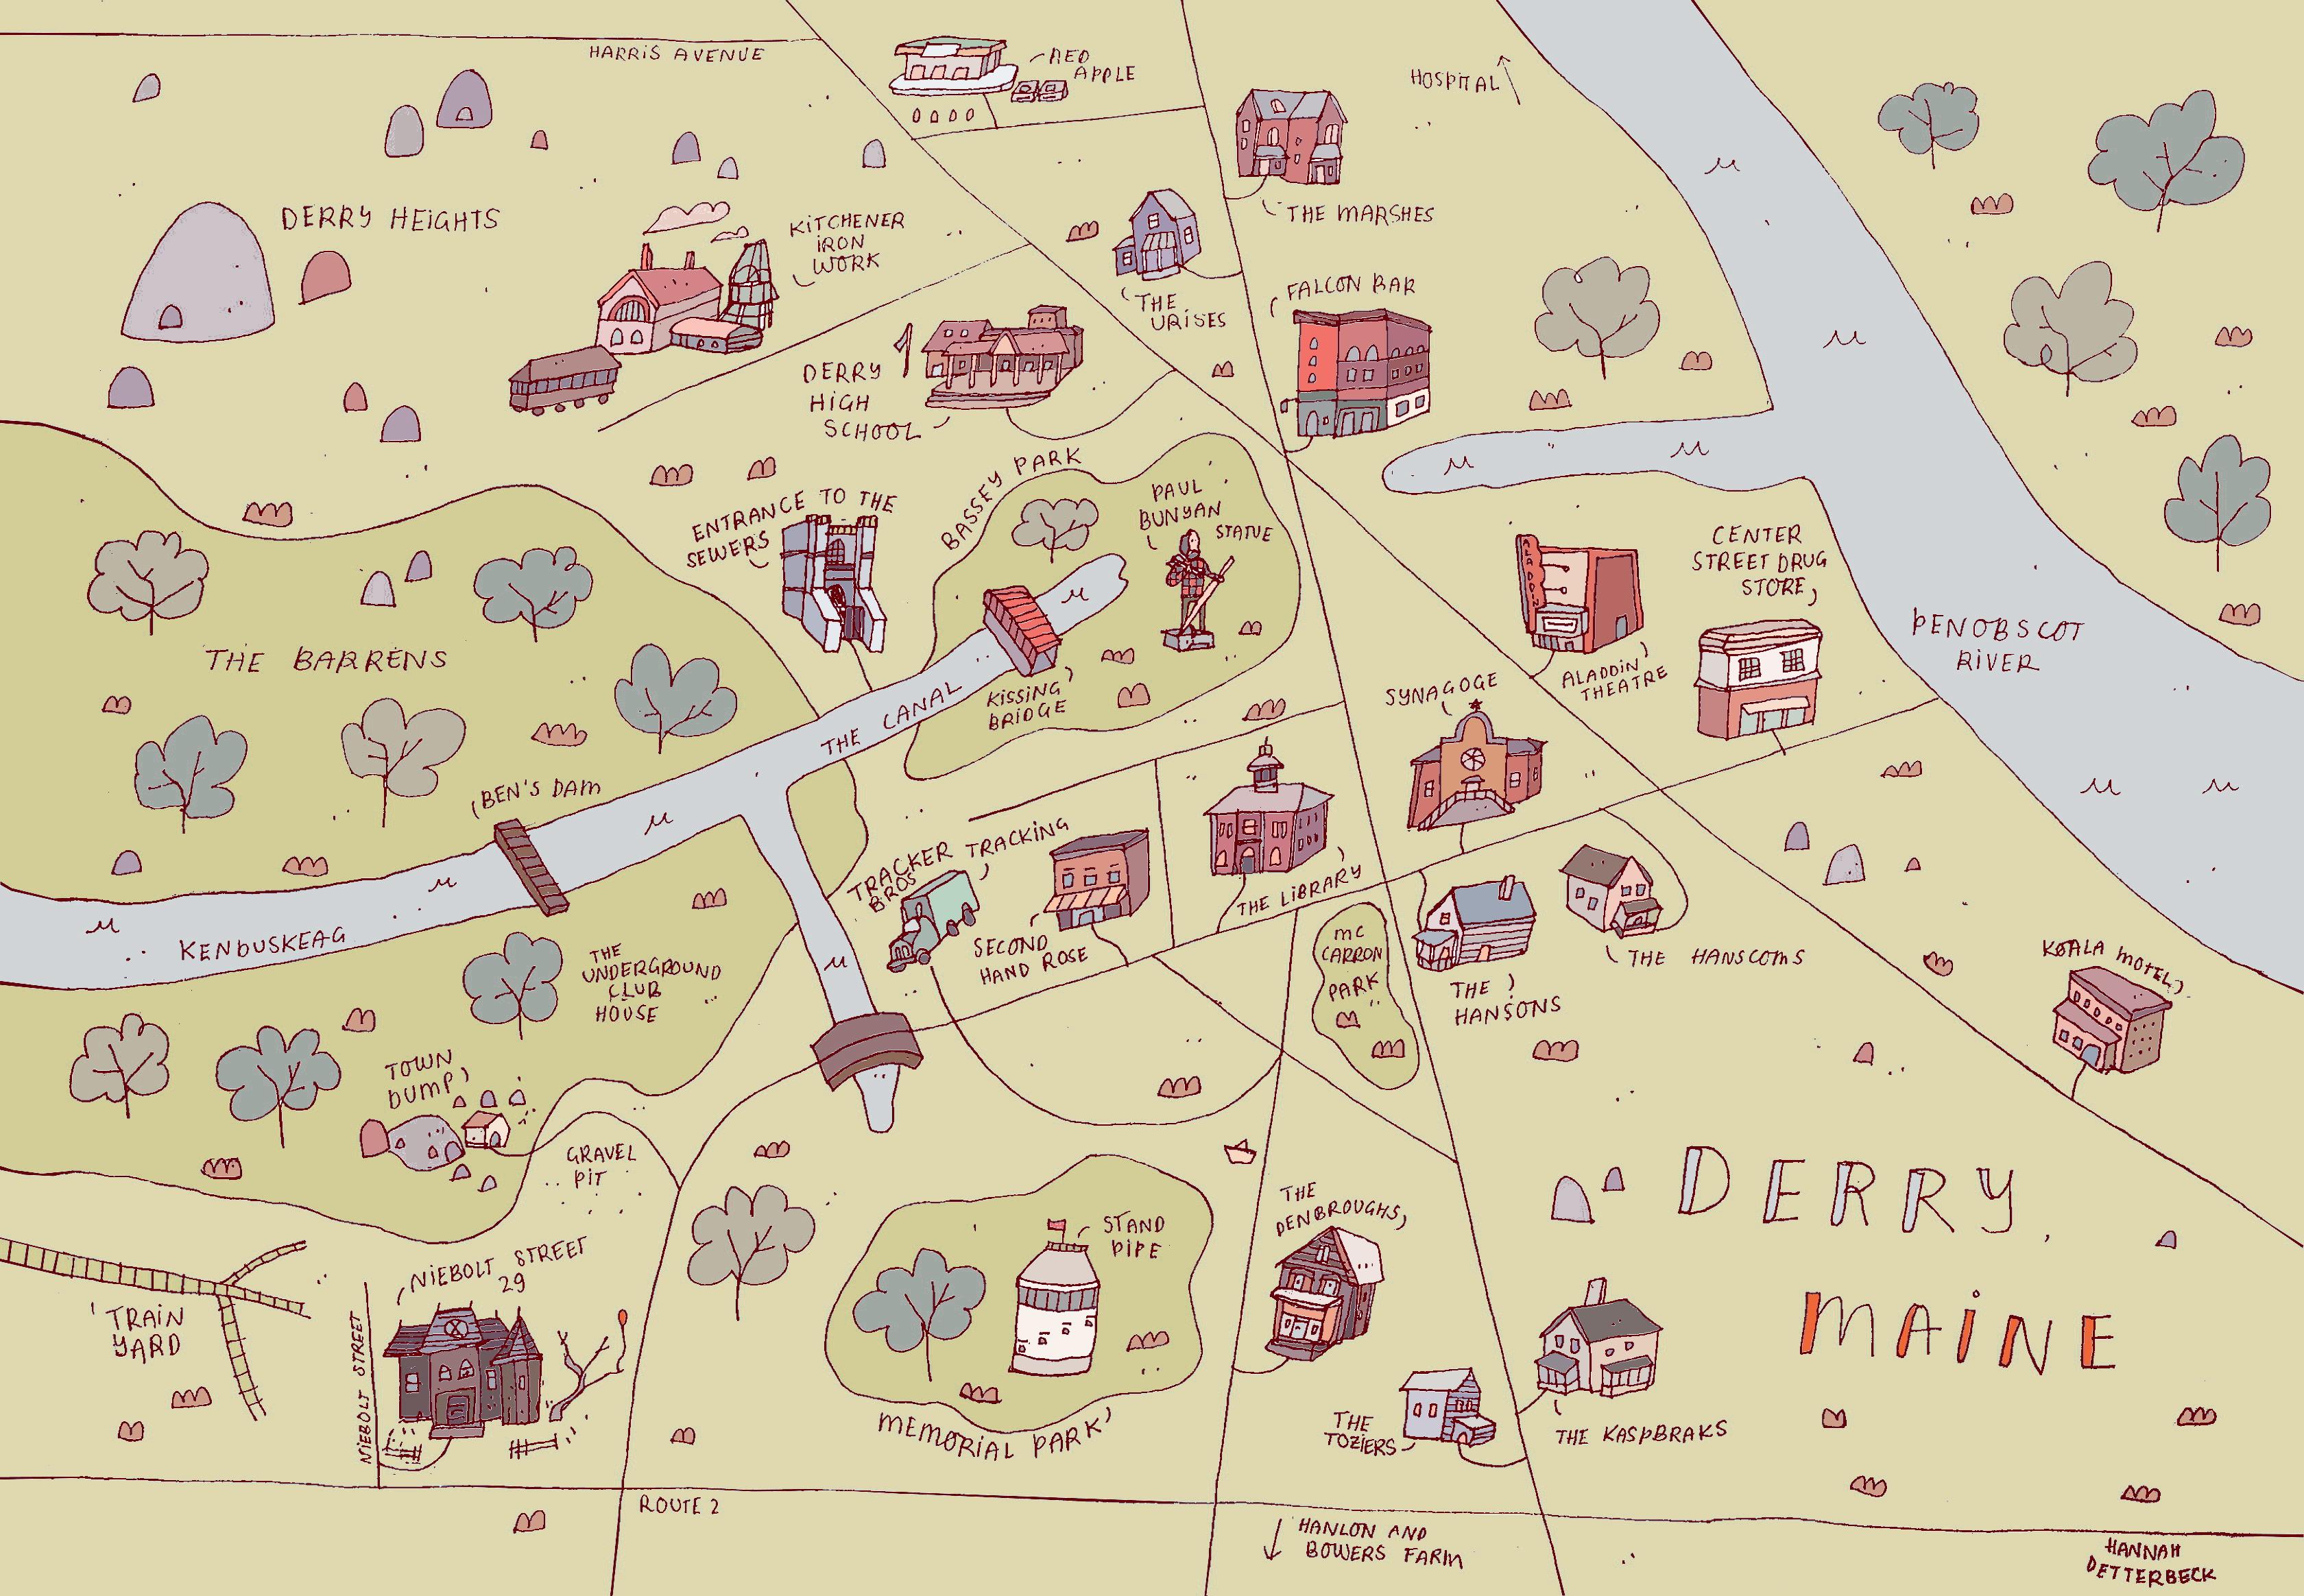 New maps: Narnia & Derry – Hannah Detterbeck